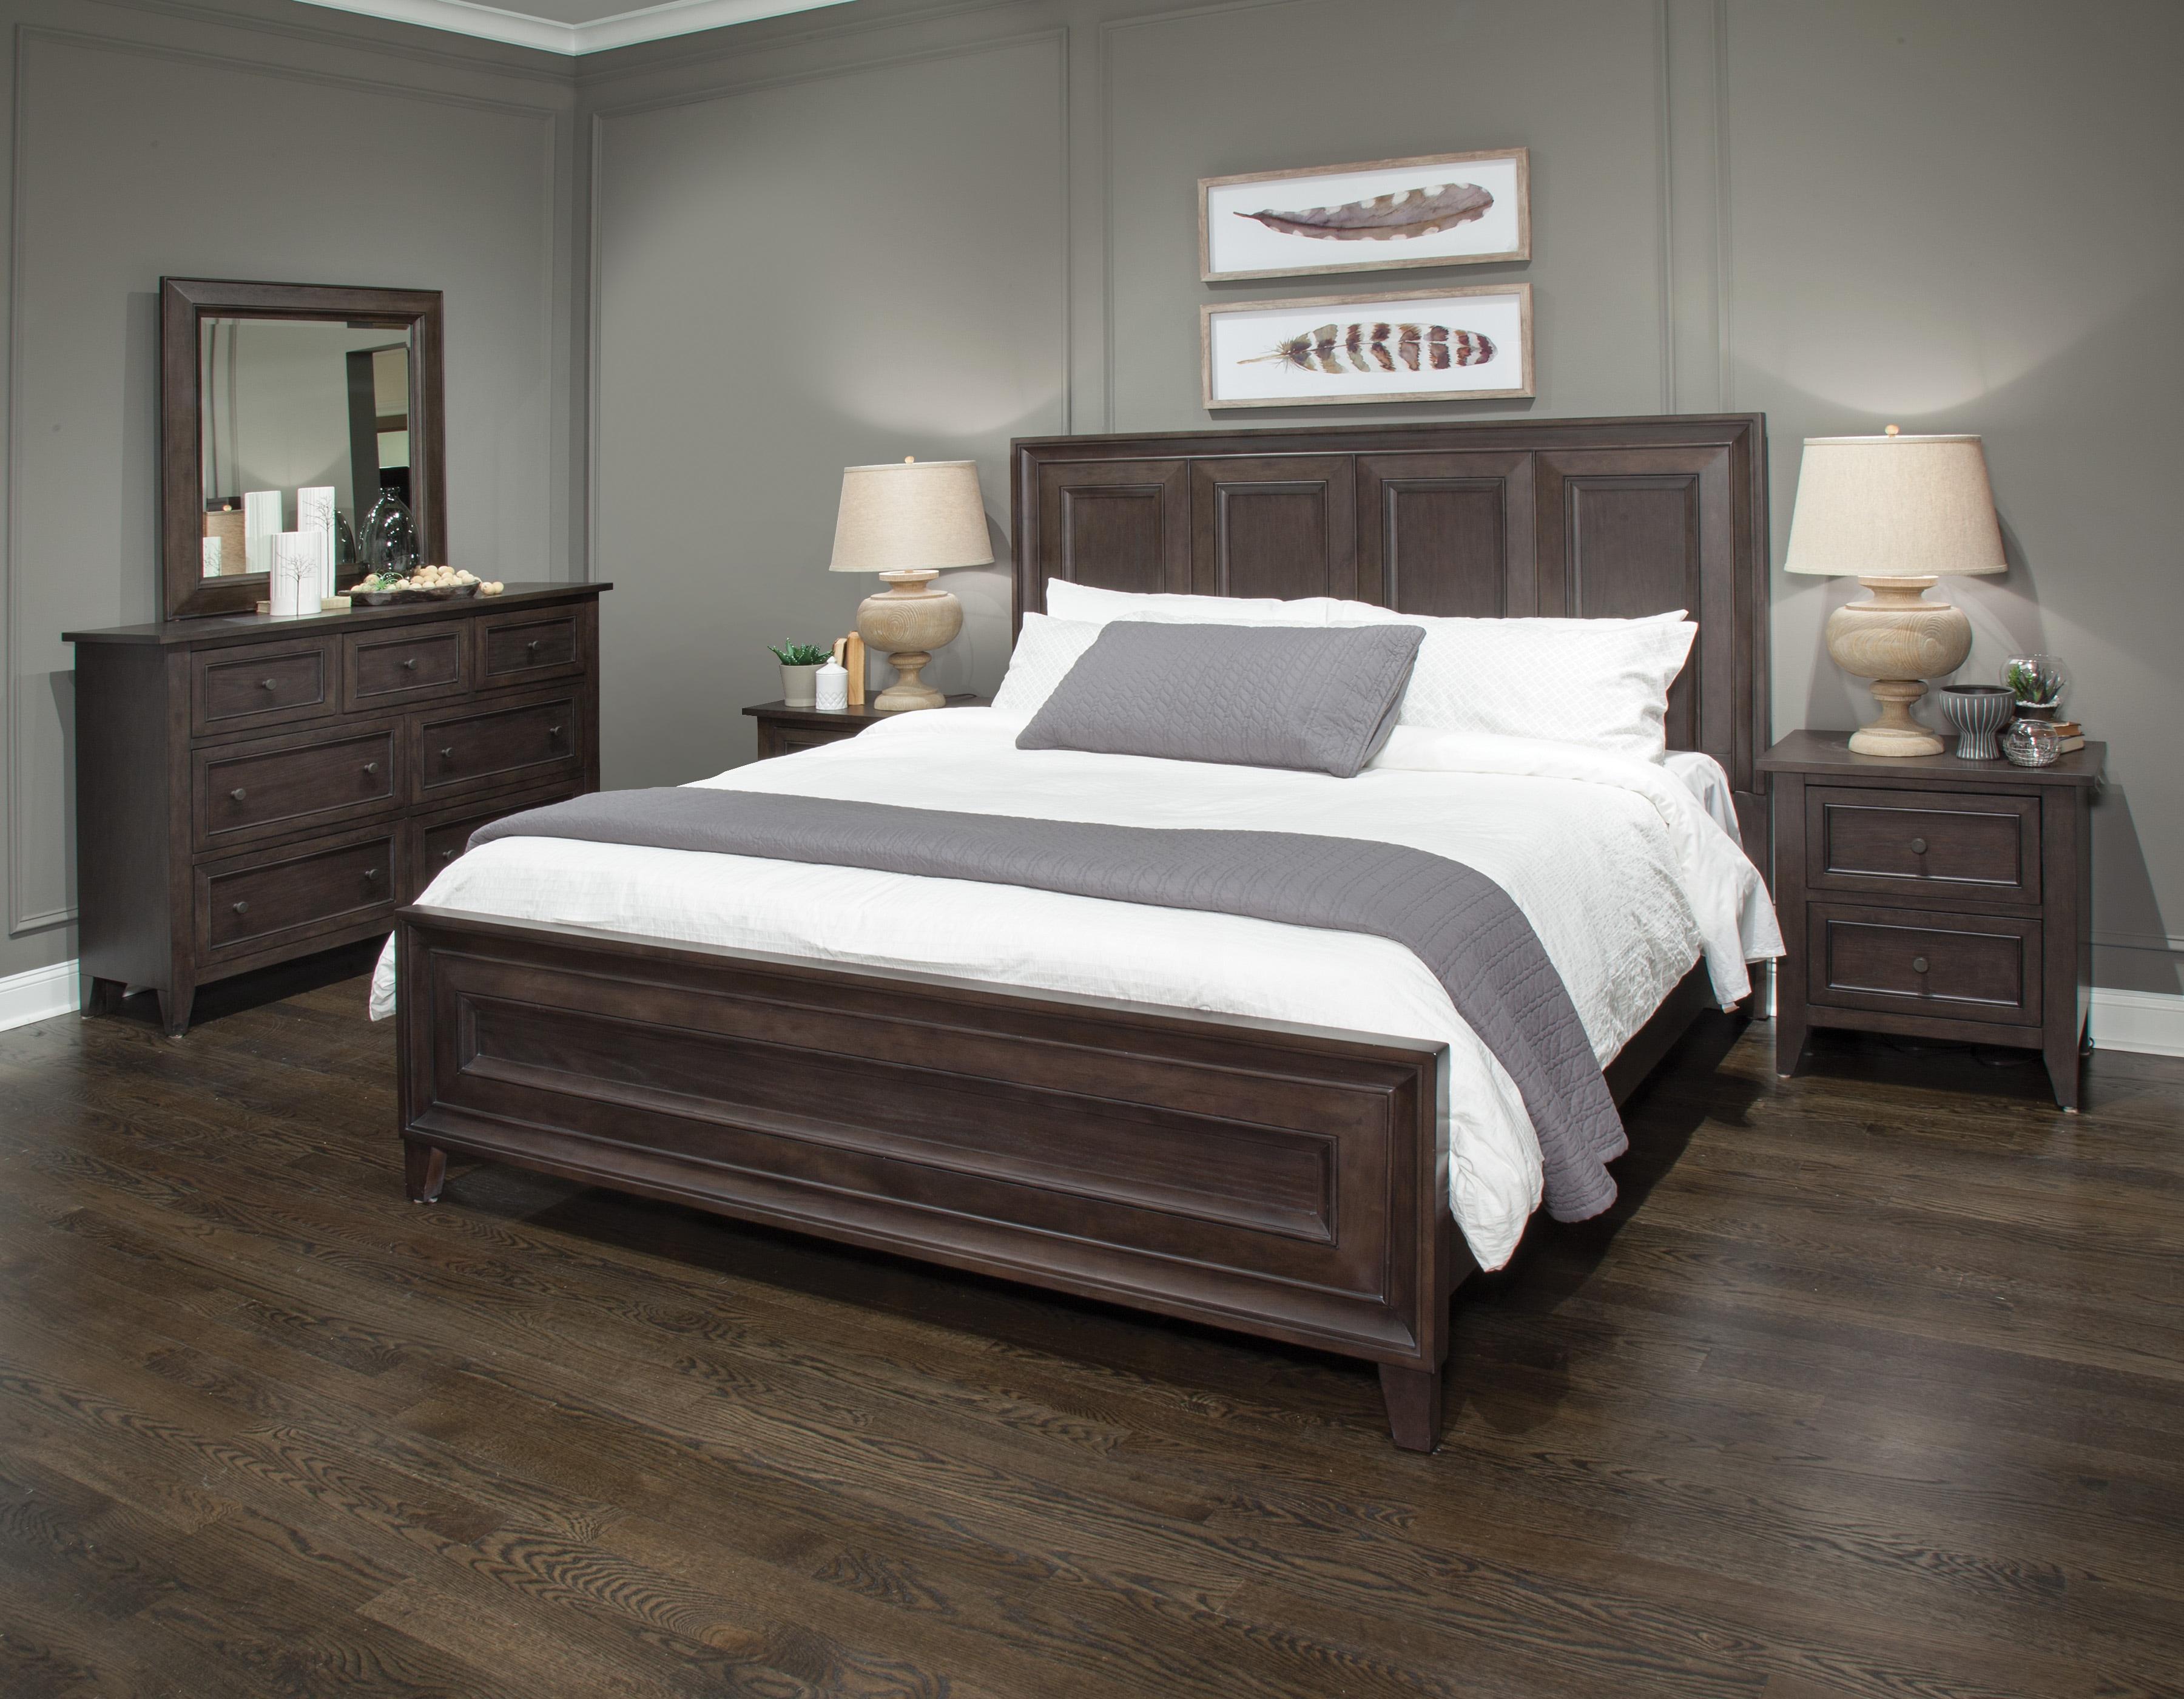 Murray Hill 4-Piece King Bedroom Set - Chestnut